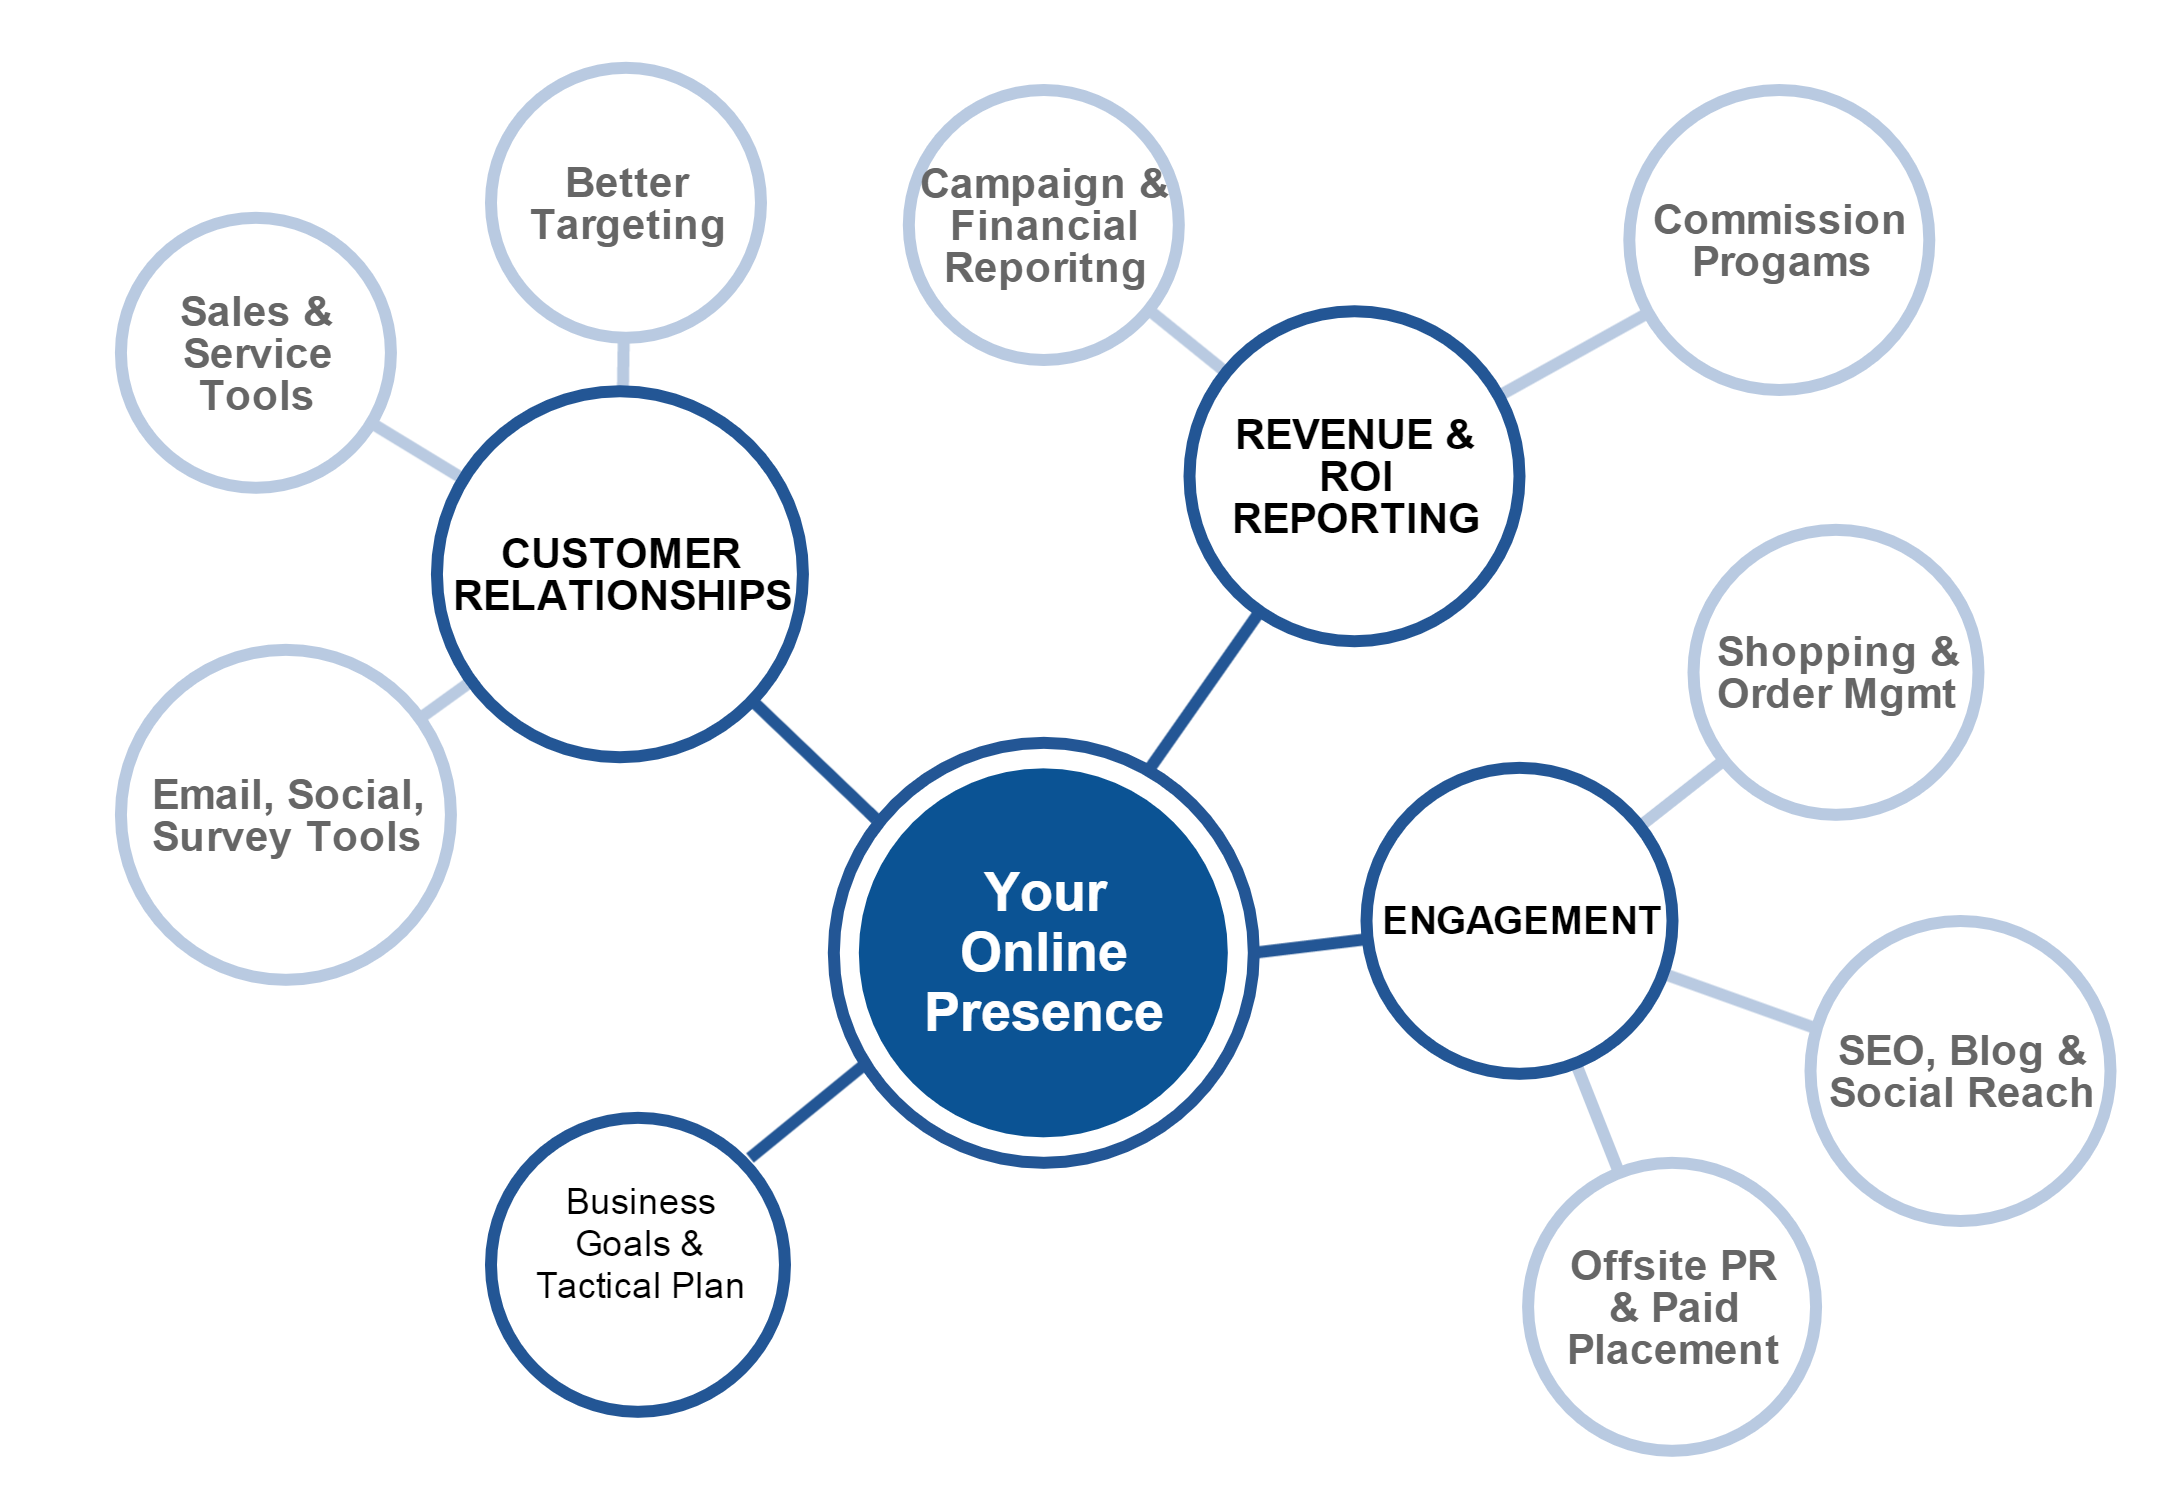 marketing_operations_visual_diagram.png